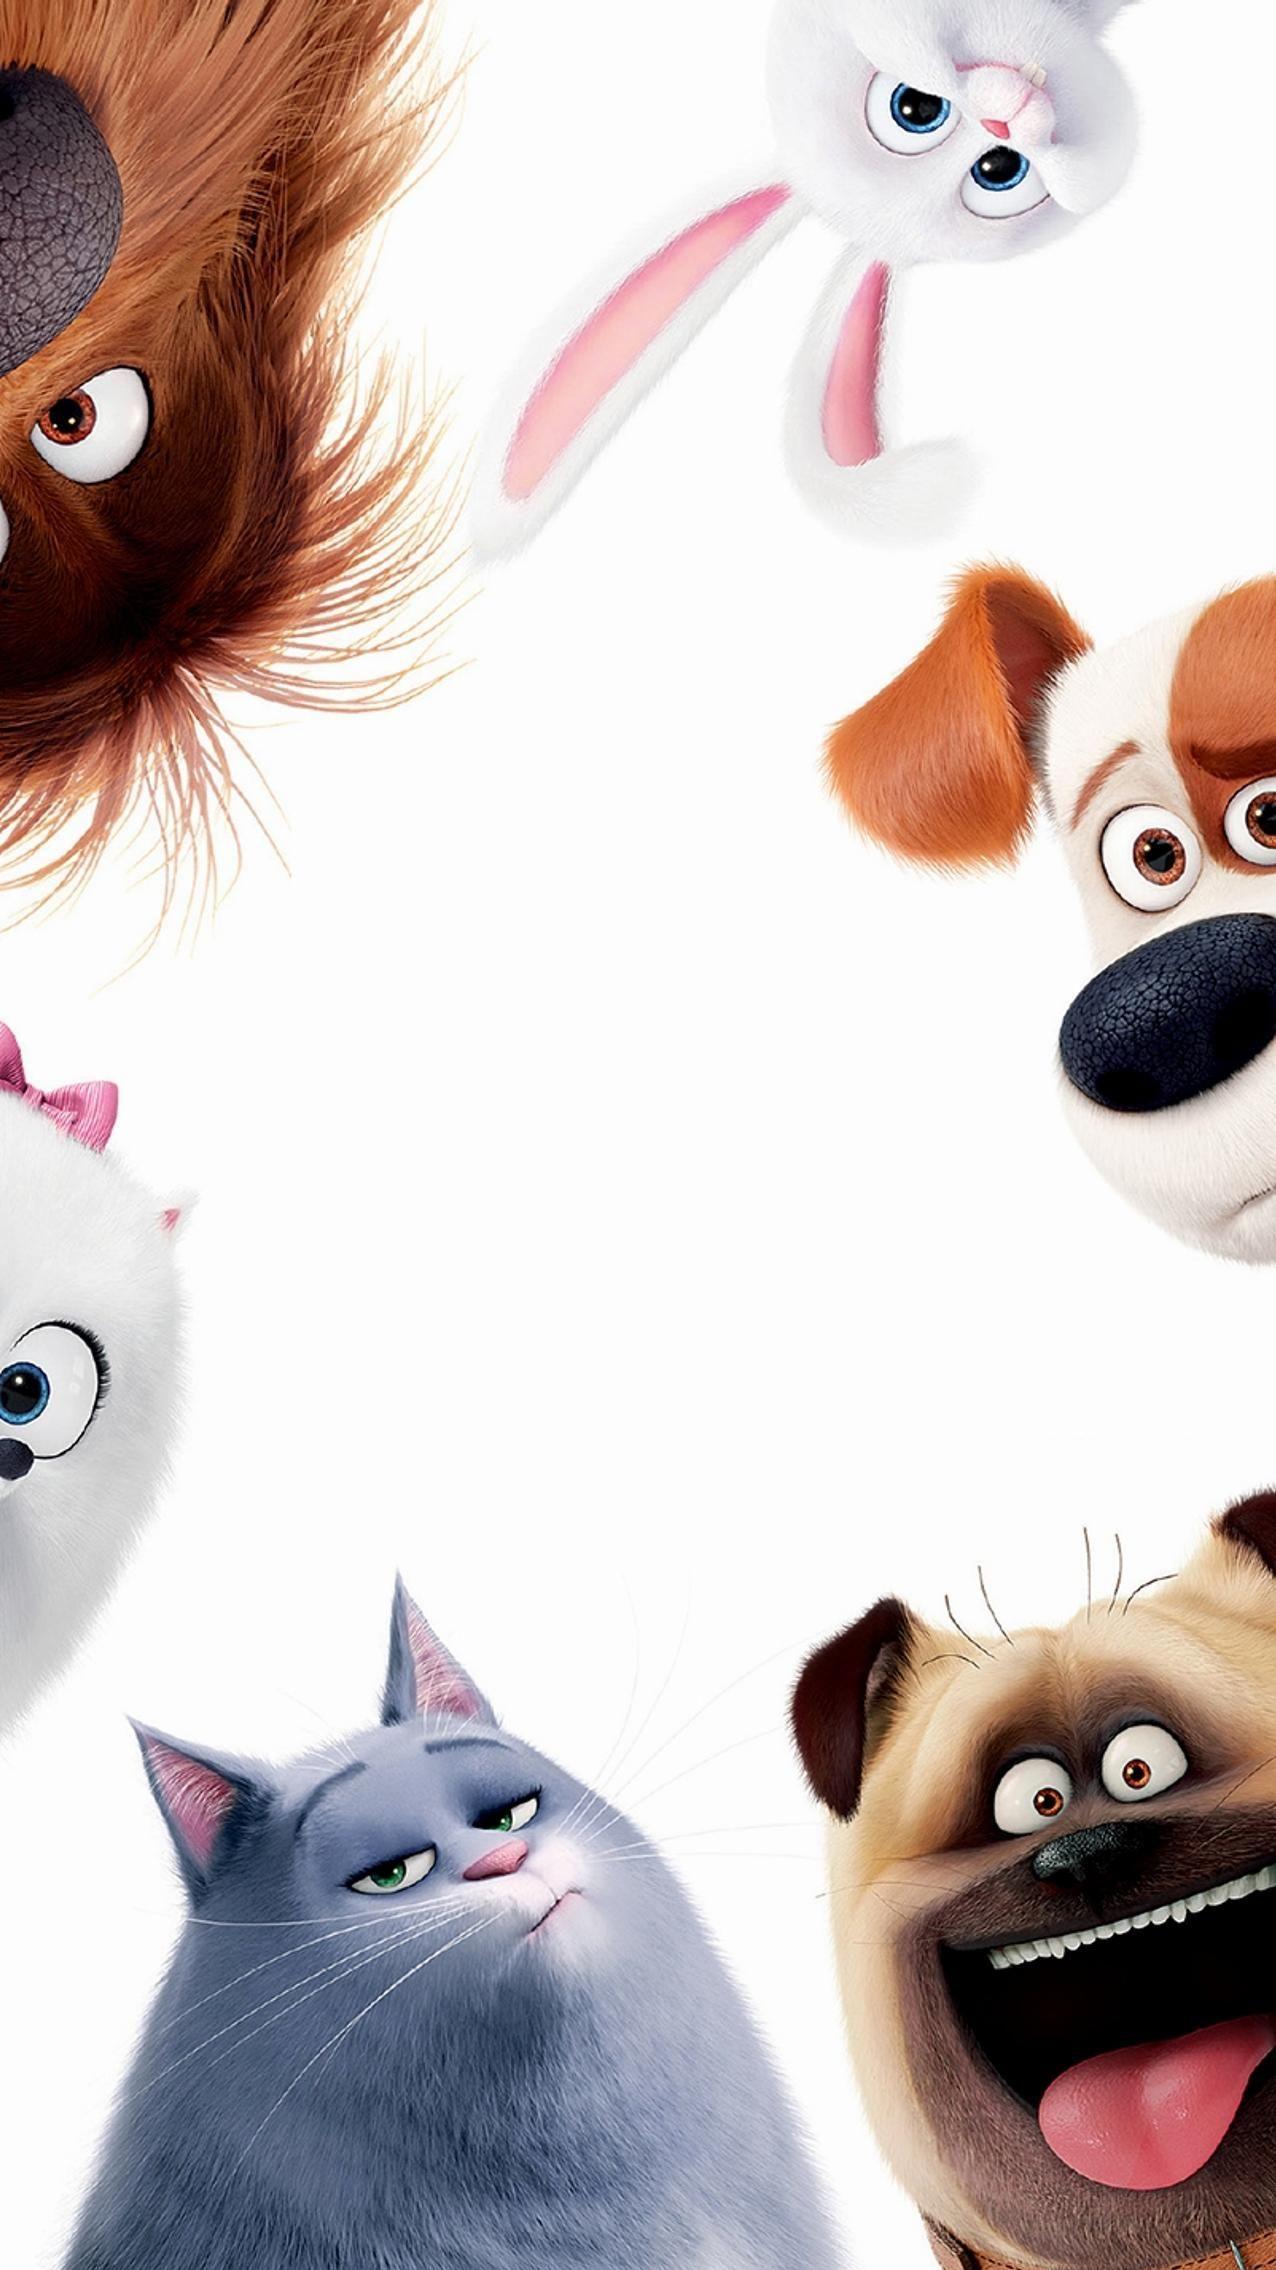 The Secret Life Of Pets 2016 Phone Wallpaper 2016 Life Of Pets Phone Secret The Cute Disney Wallpaper Disney Phone Wallpaper Wallpaper Iphone Disney